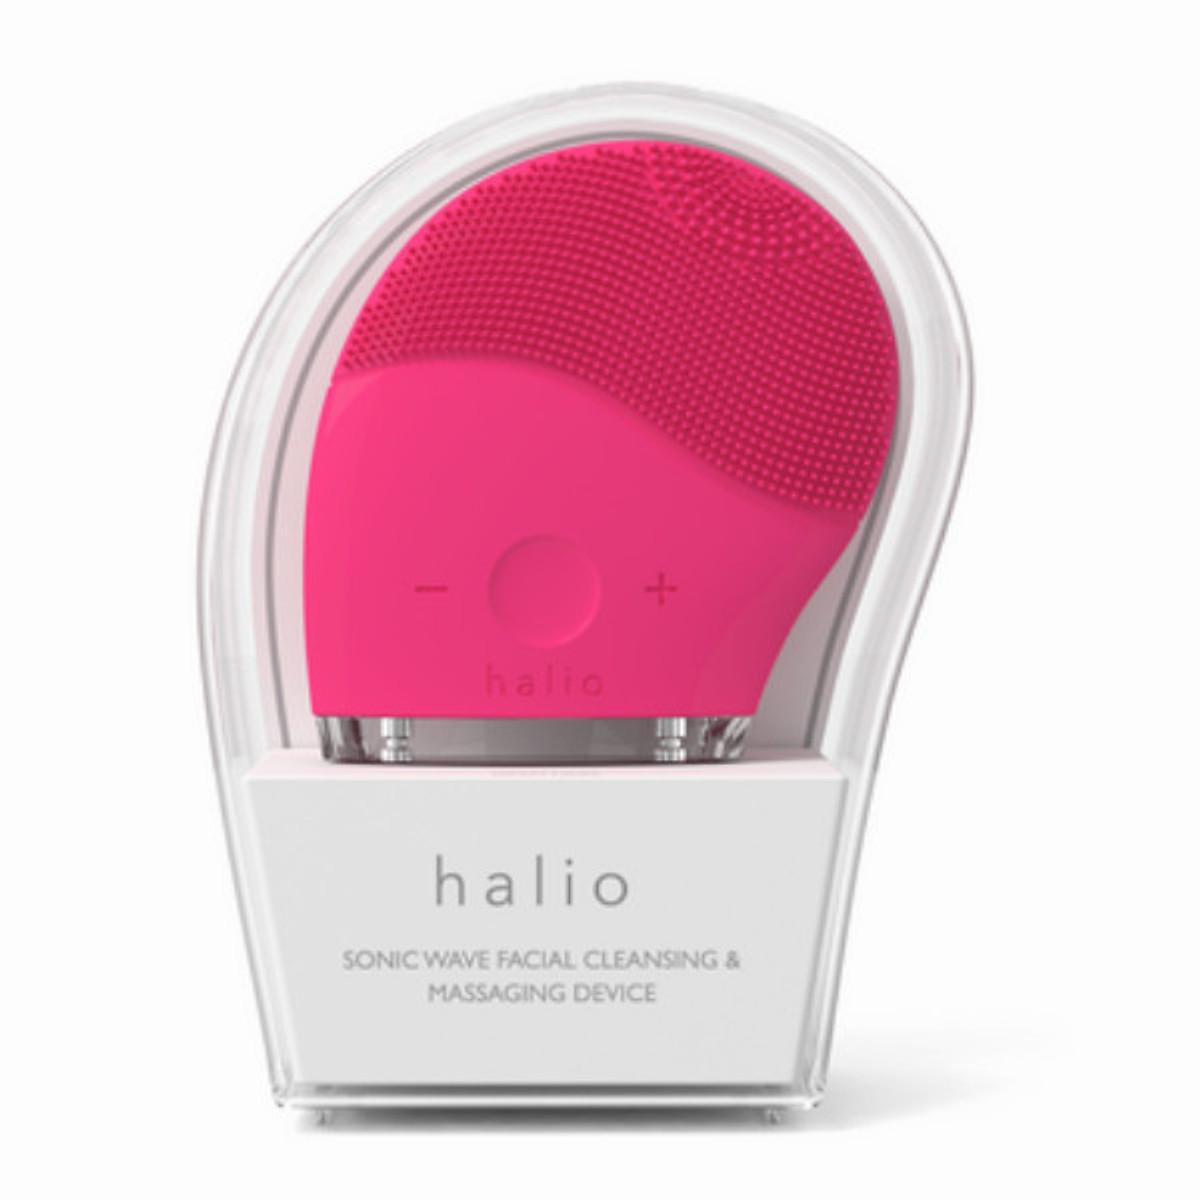 Máy Rửa Mặt Và Mát Xa Da Mặt Halio Facial Cleansing & Massaging Device |  Tiki